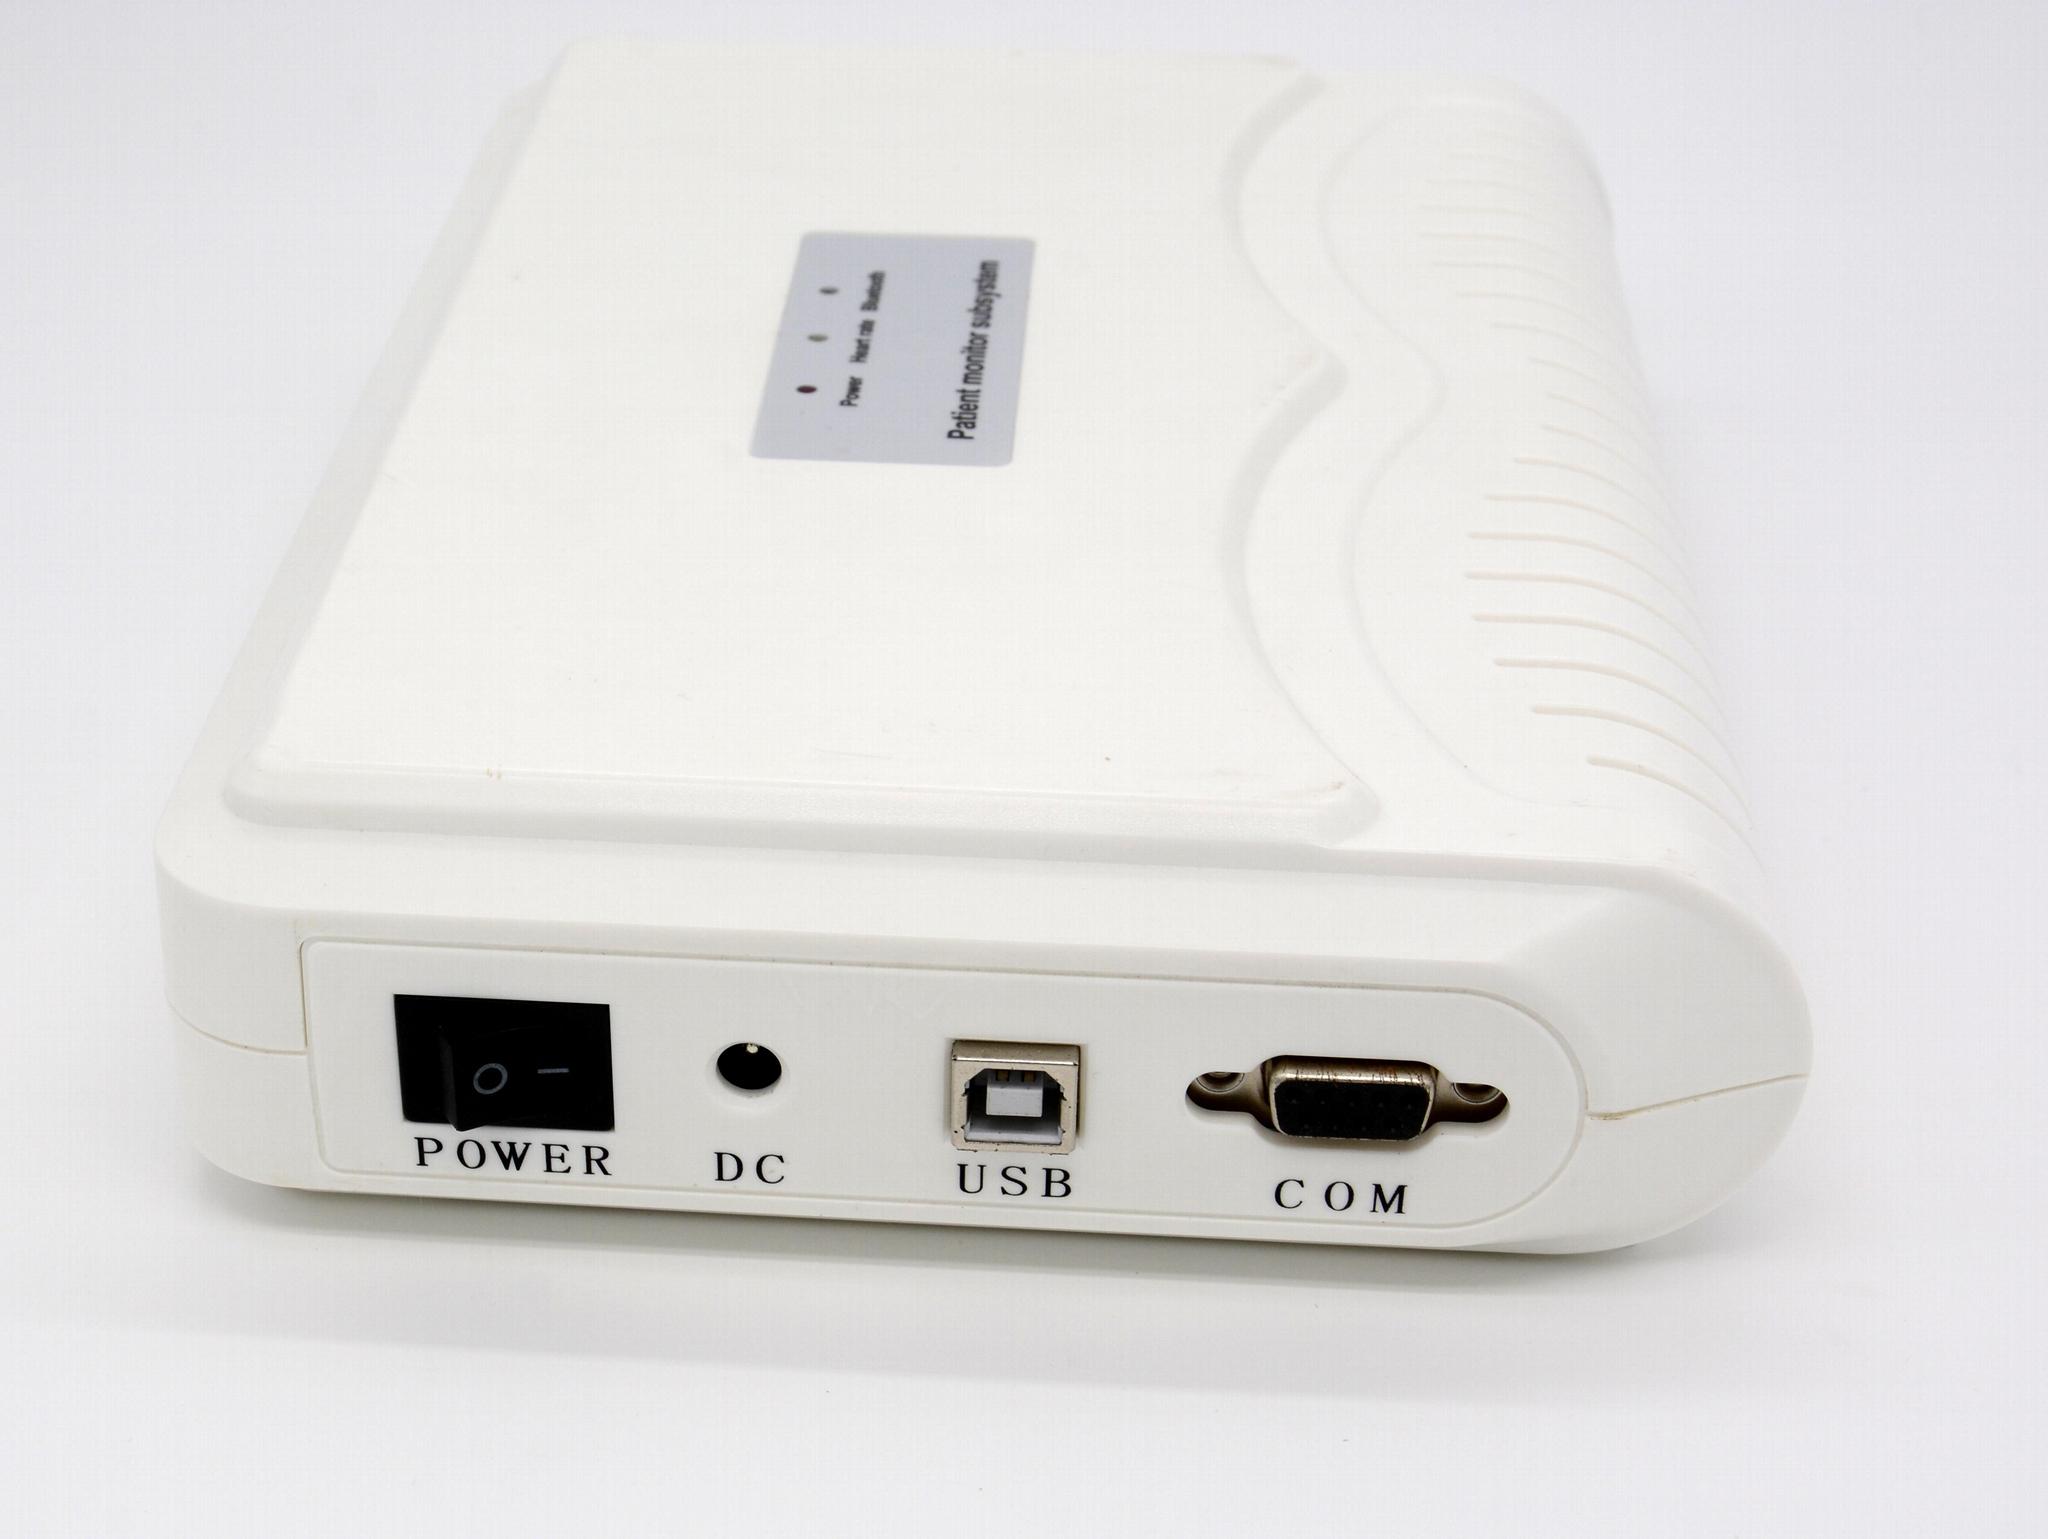 CE ISO认证的7英寸便携式生命体征监护仪 5